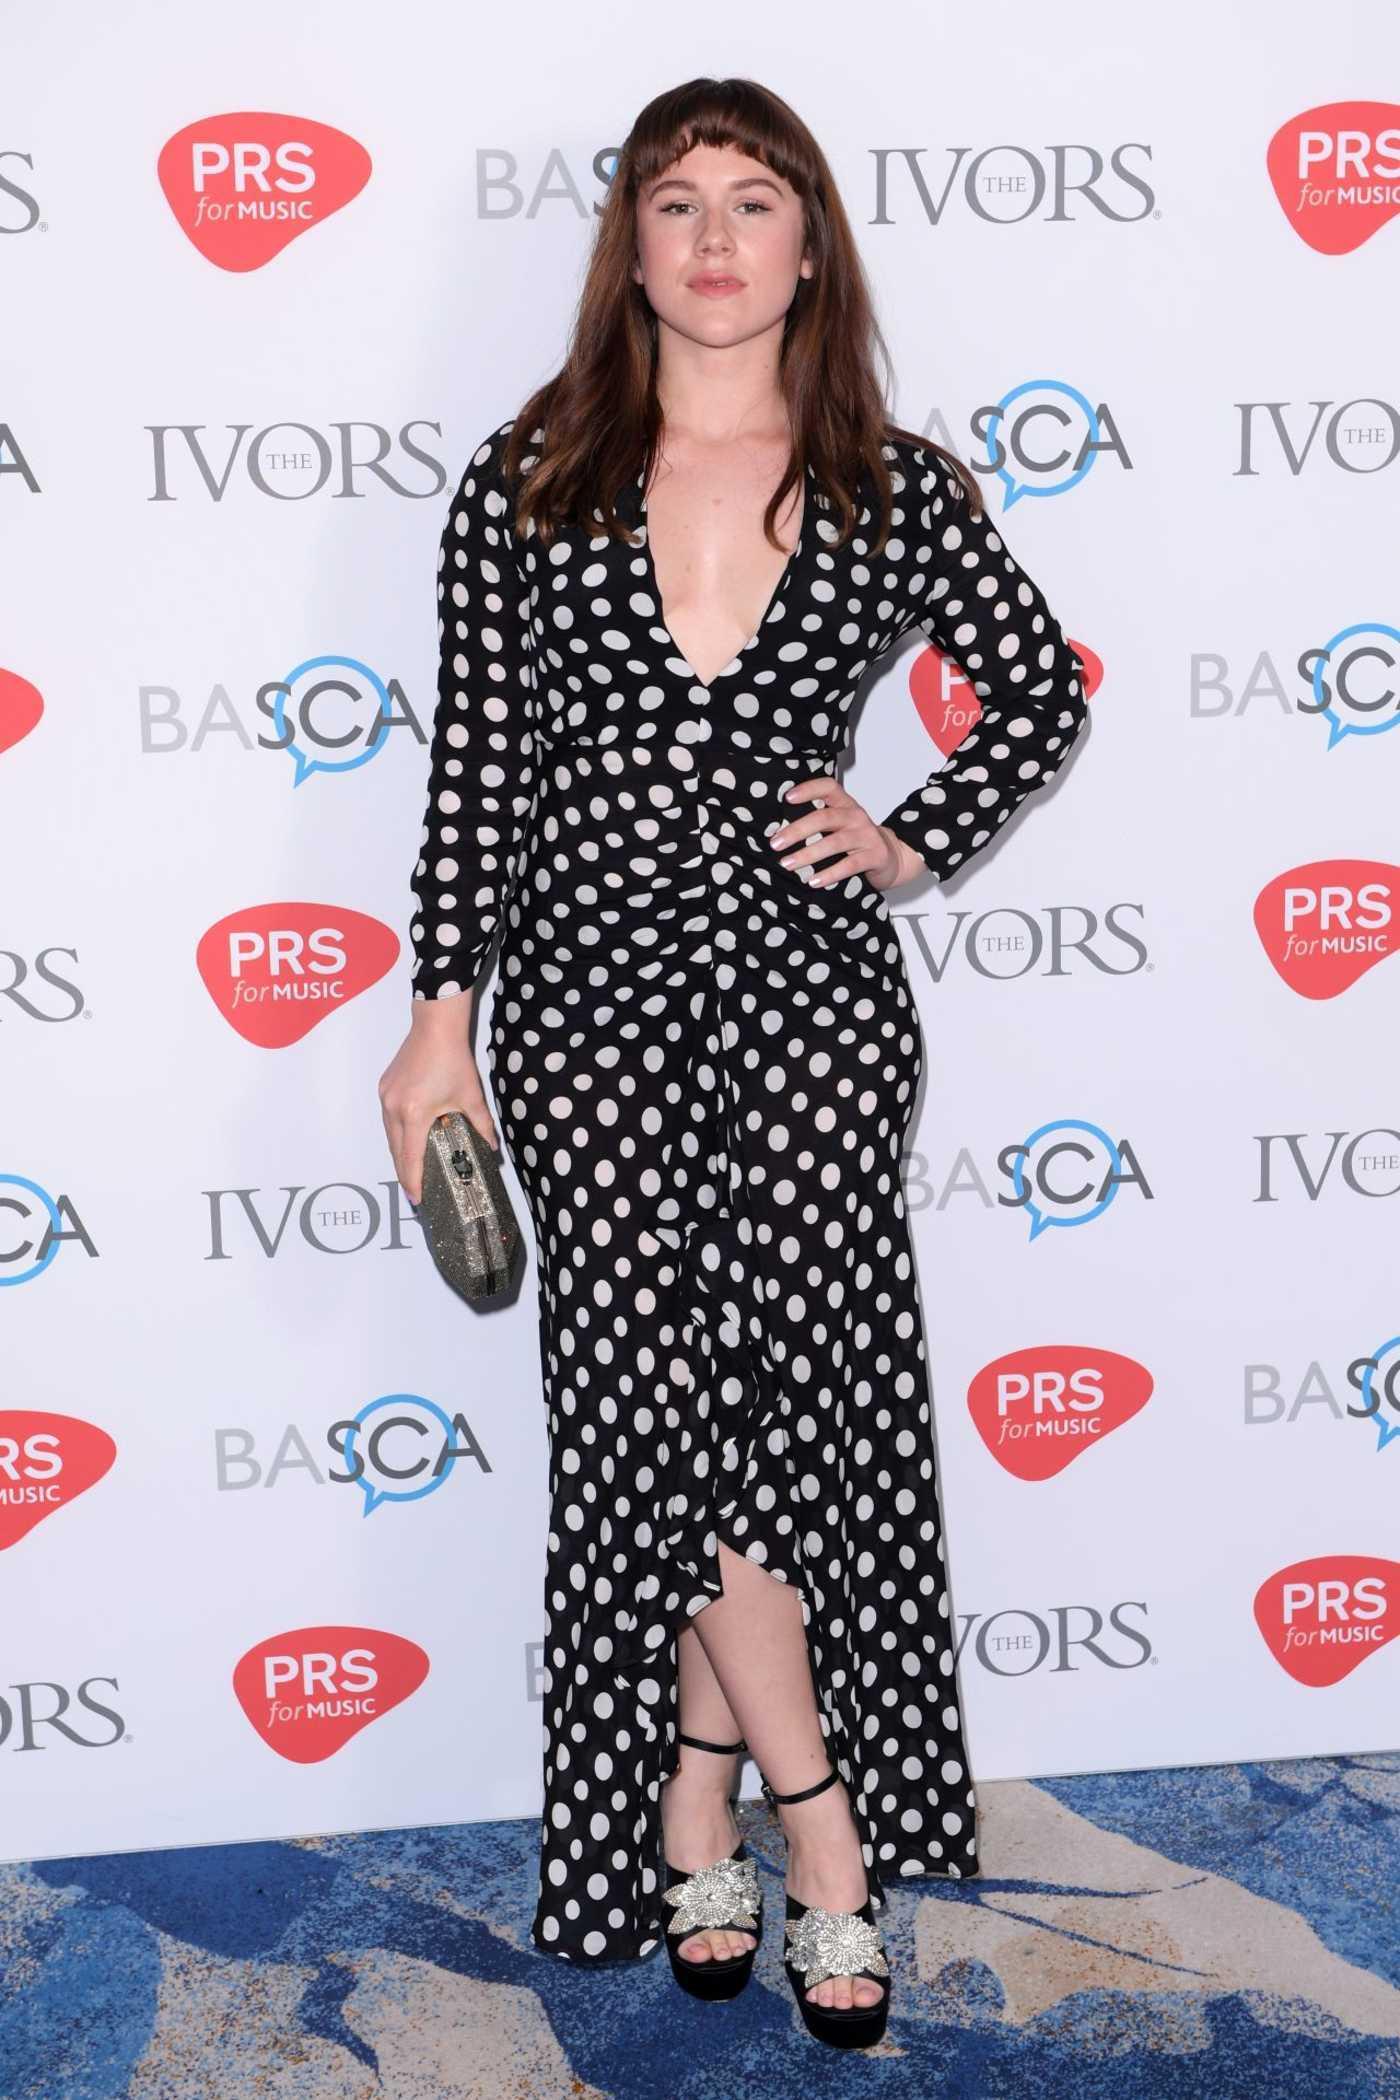 Katy B at 2018 Ivor Novello Awards in London 05/31/2018